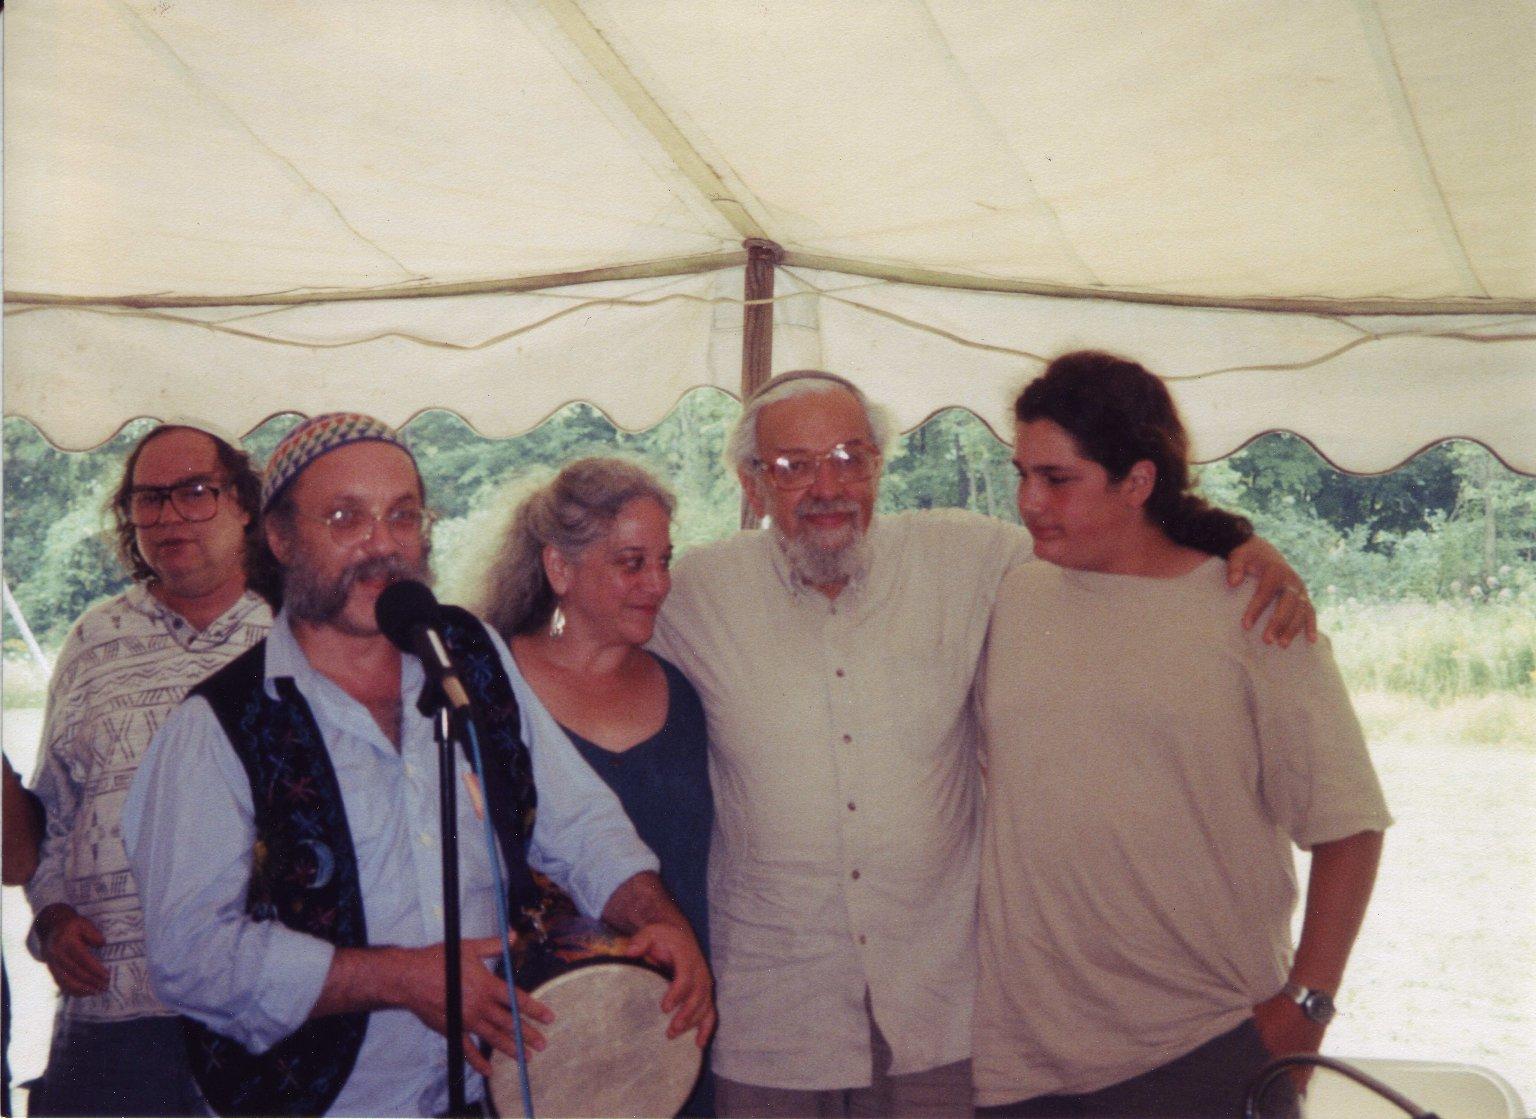 Cantor Robert Michael Esformes performing for Rabbi Zalman Schachter-Shalomi at his 75th birthday celebration at Elat Chayyim, ca. 1999.